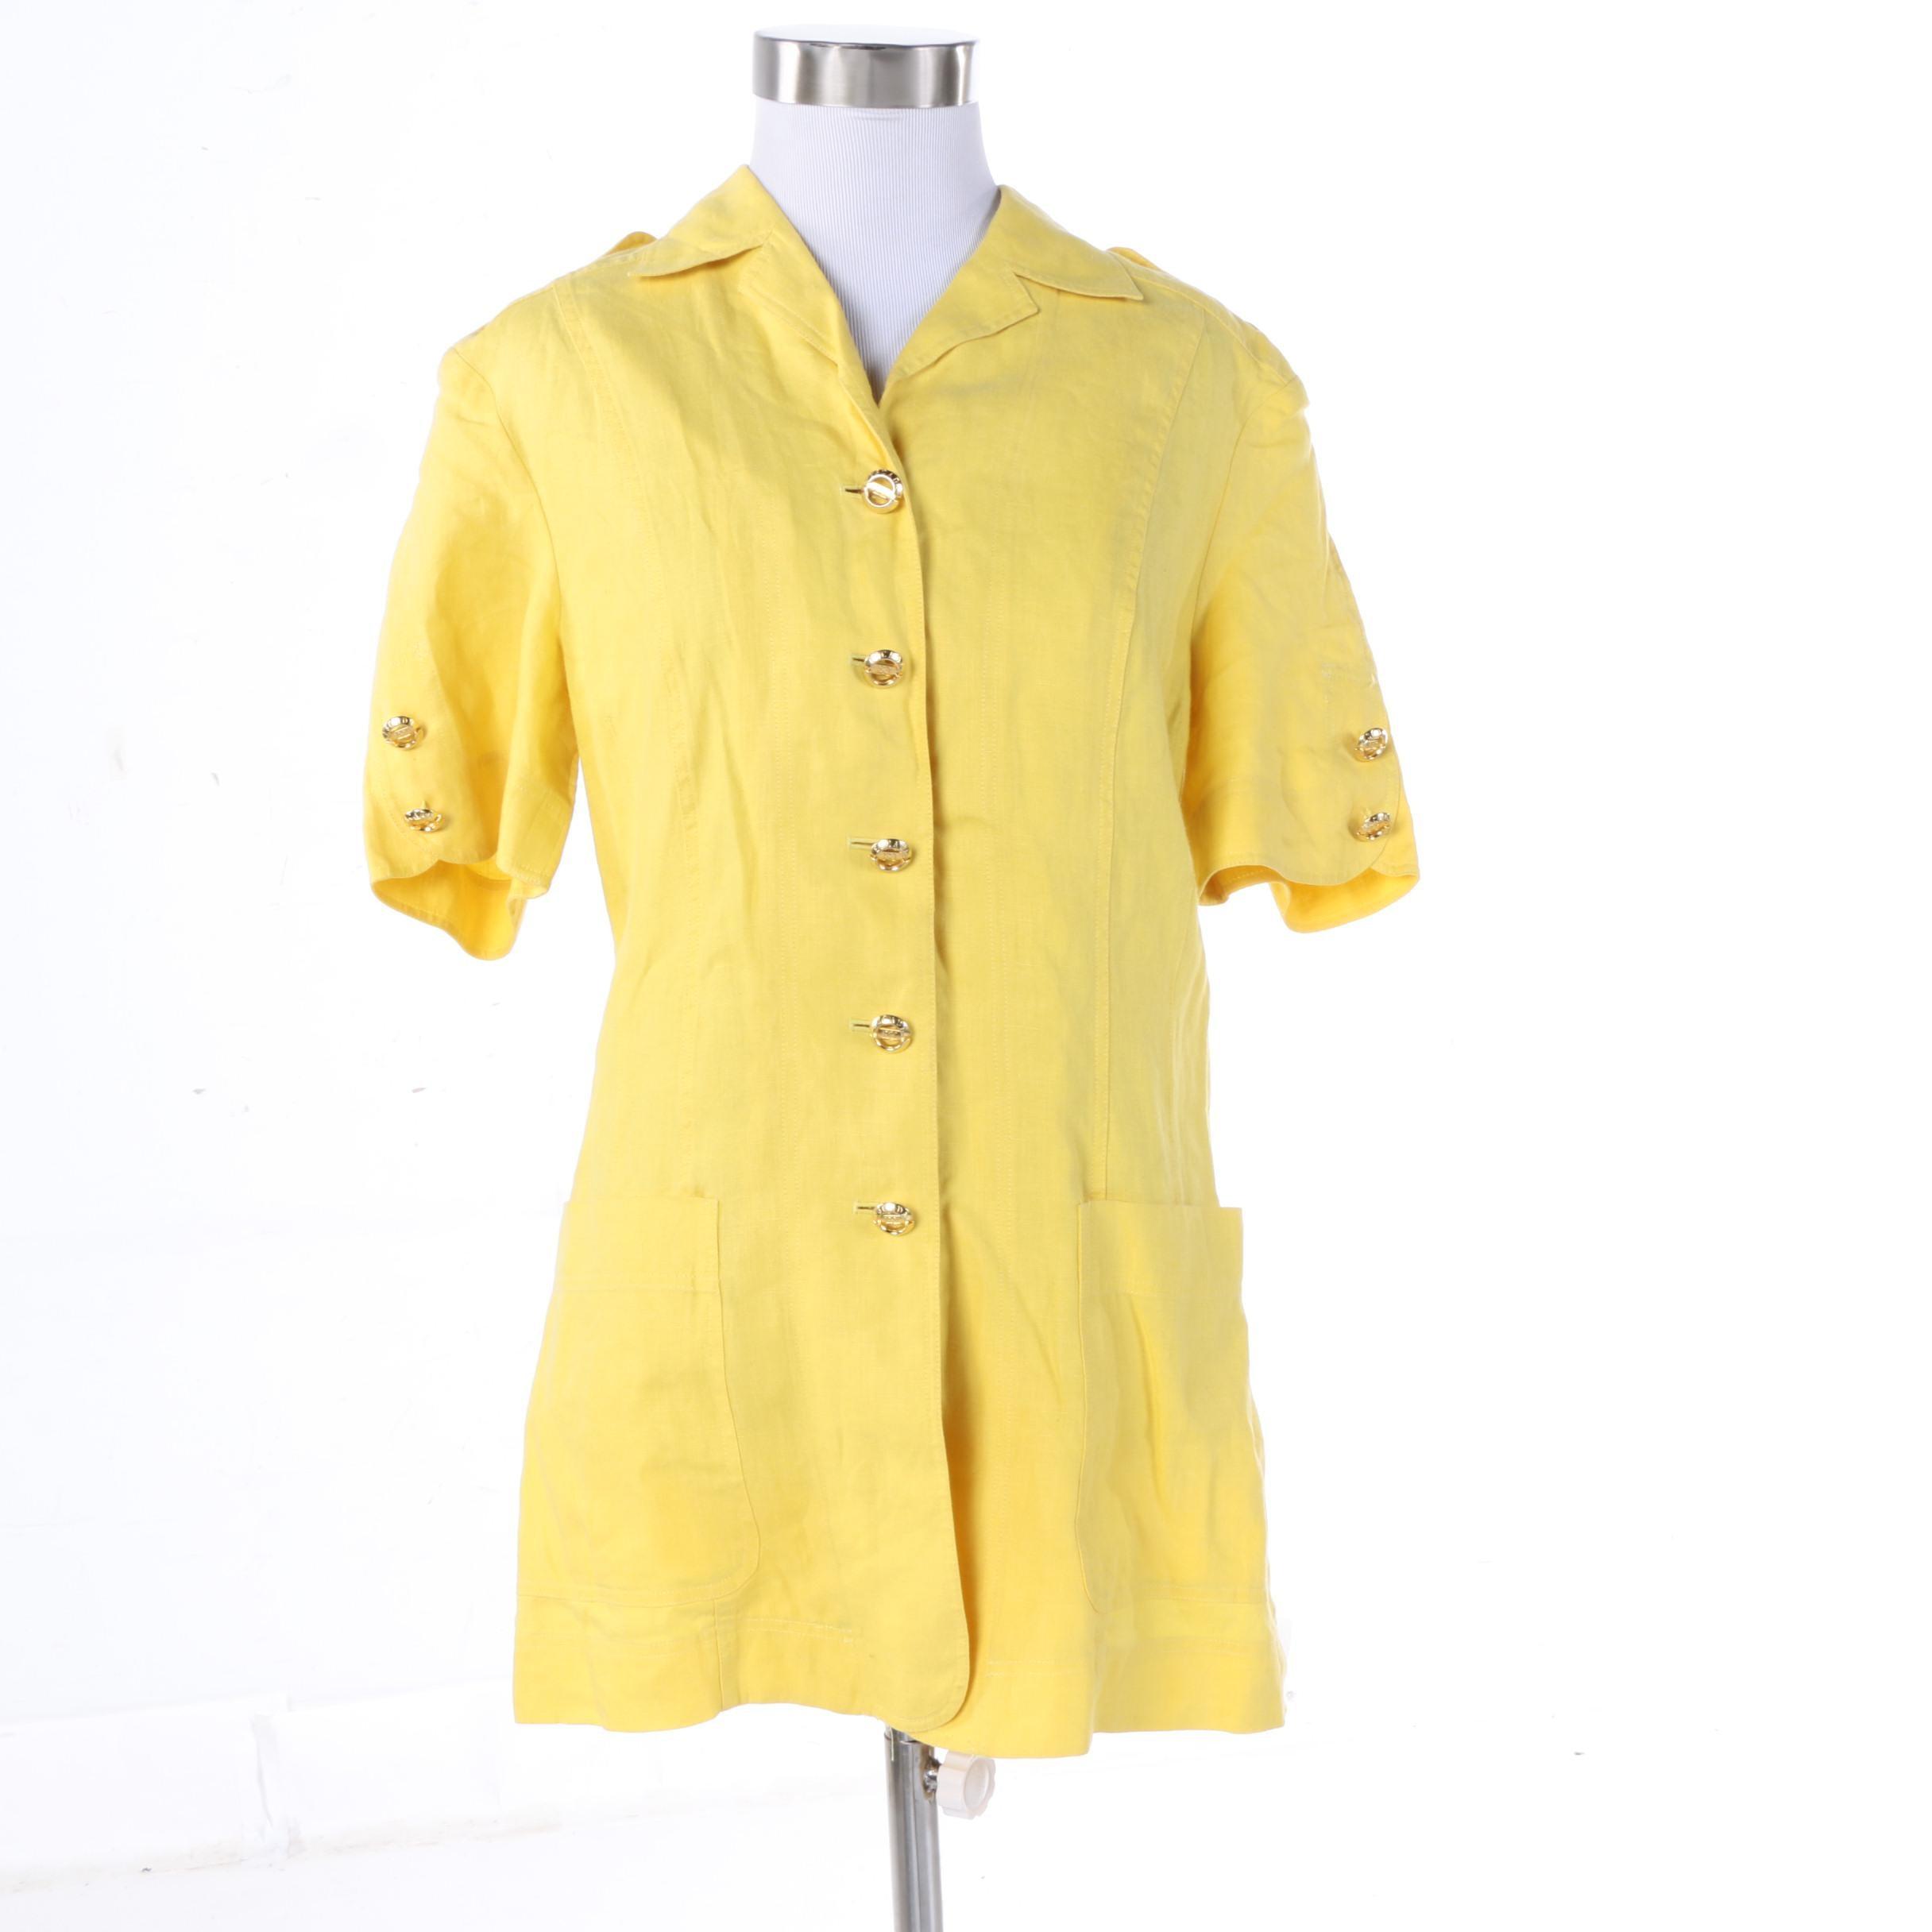 Vintage Escada Margaretha Ley Yellow Linen Short Sleeve Jacket